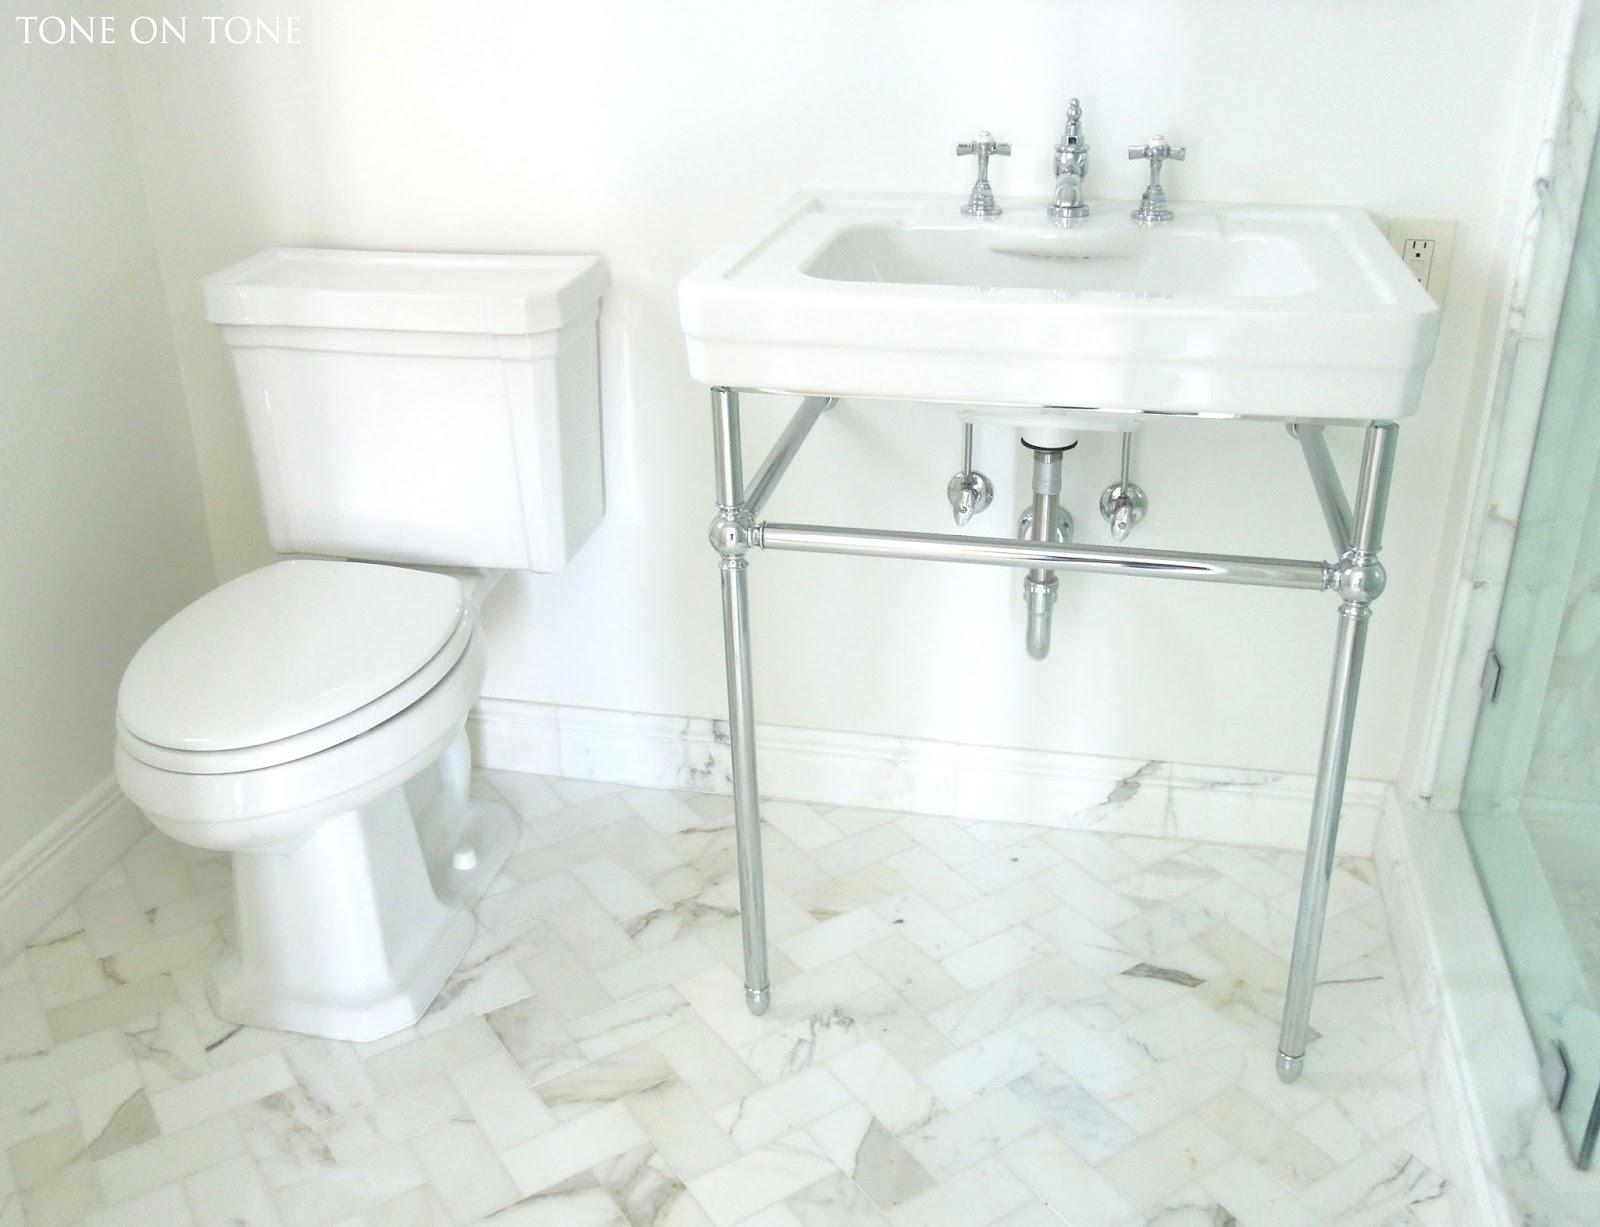 Tone on Tone: Small Bathroom Renovation